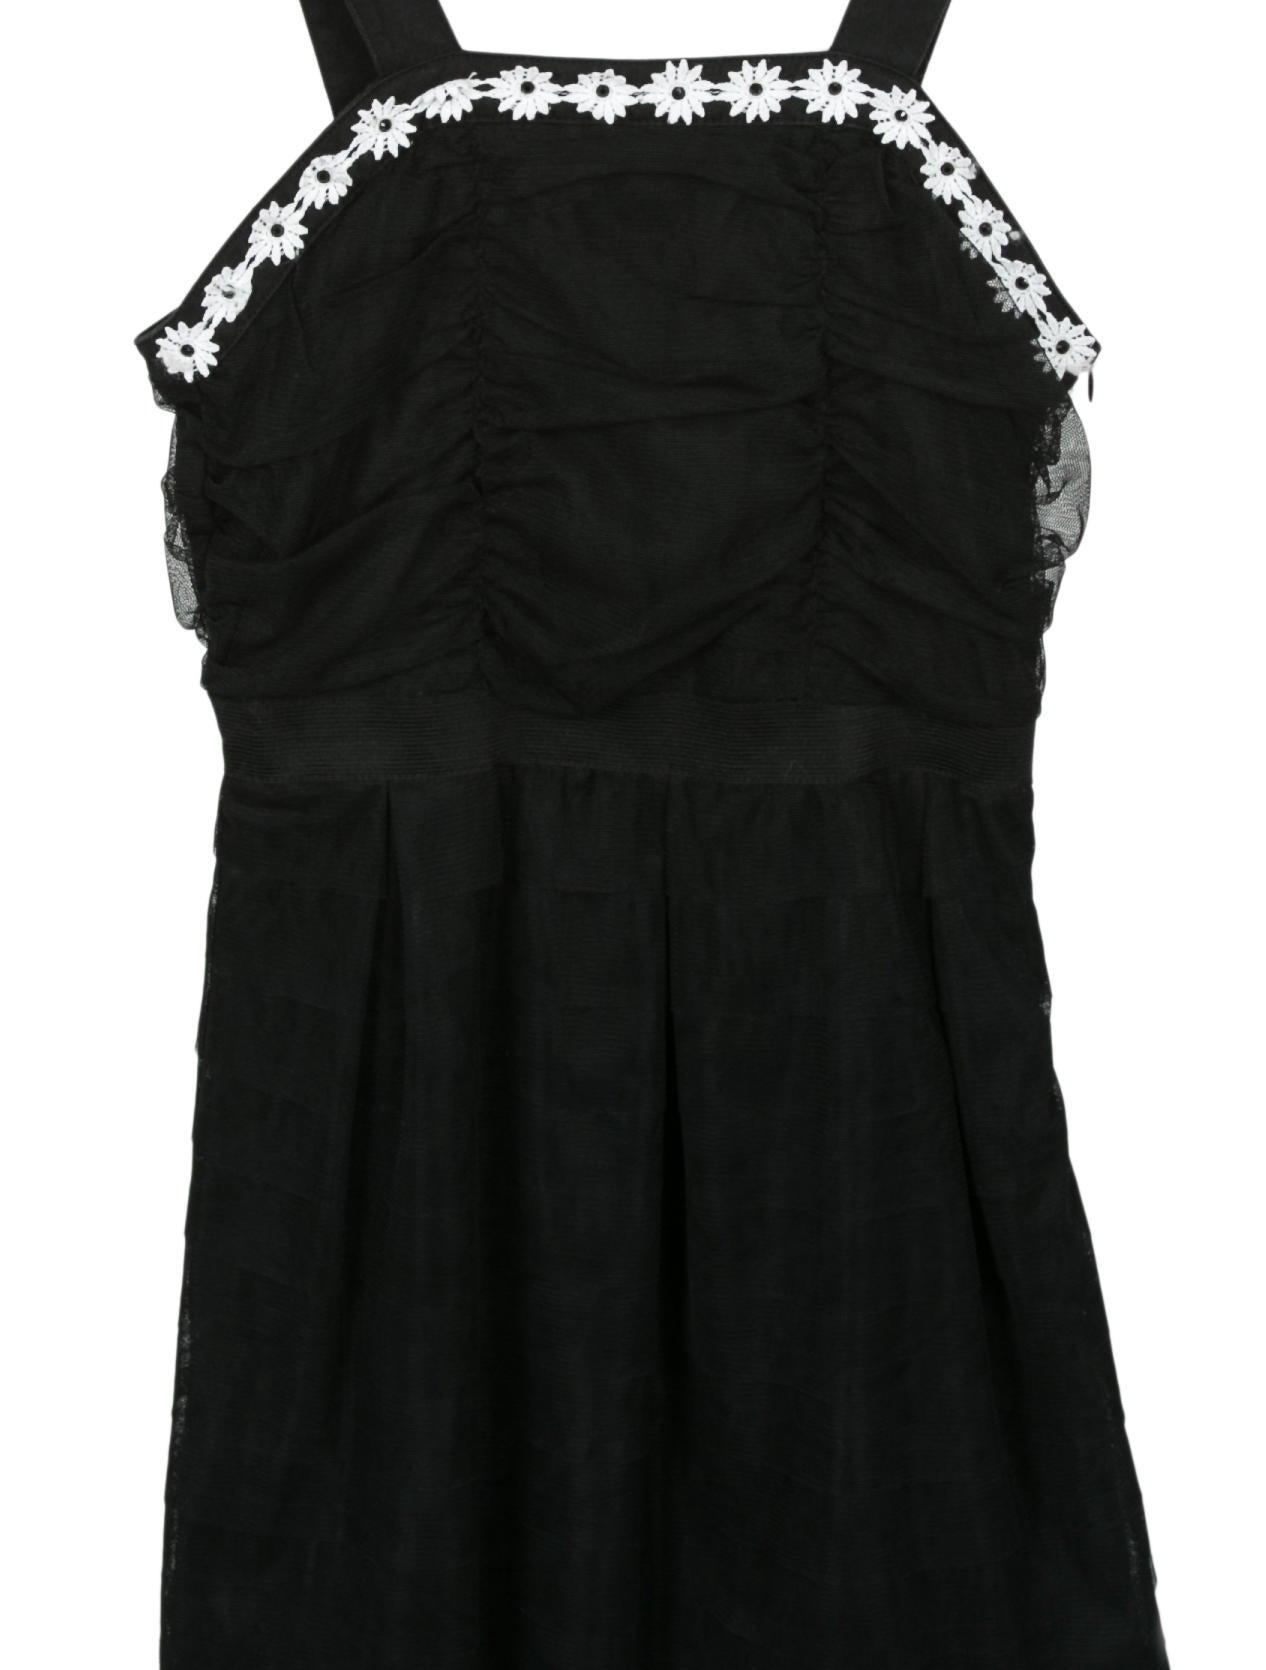 Miss Blumarine Girls' Embellished A-Line Dress